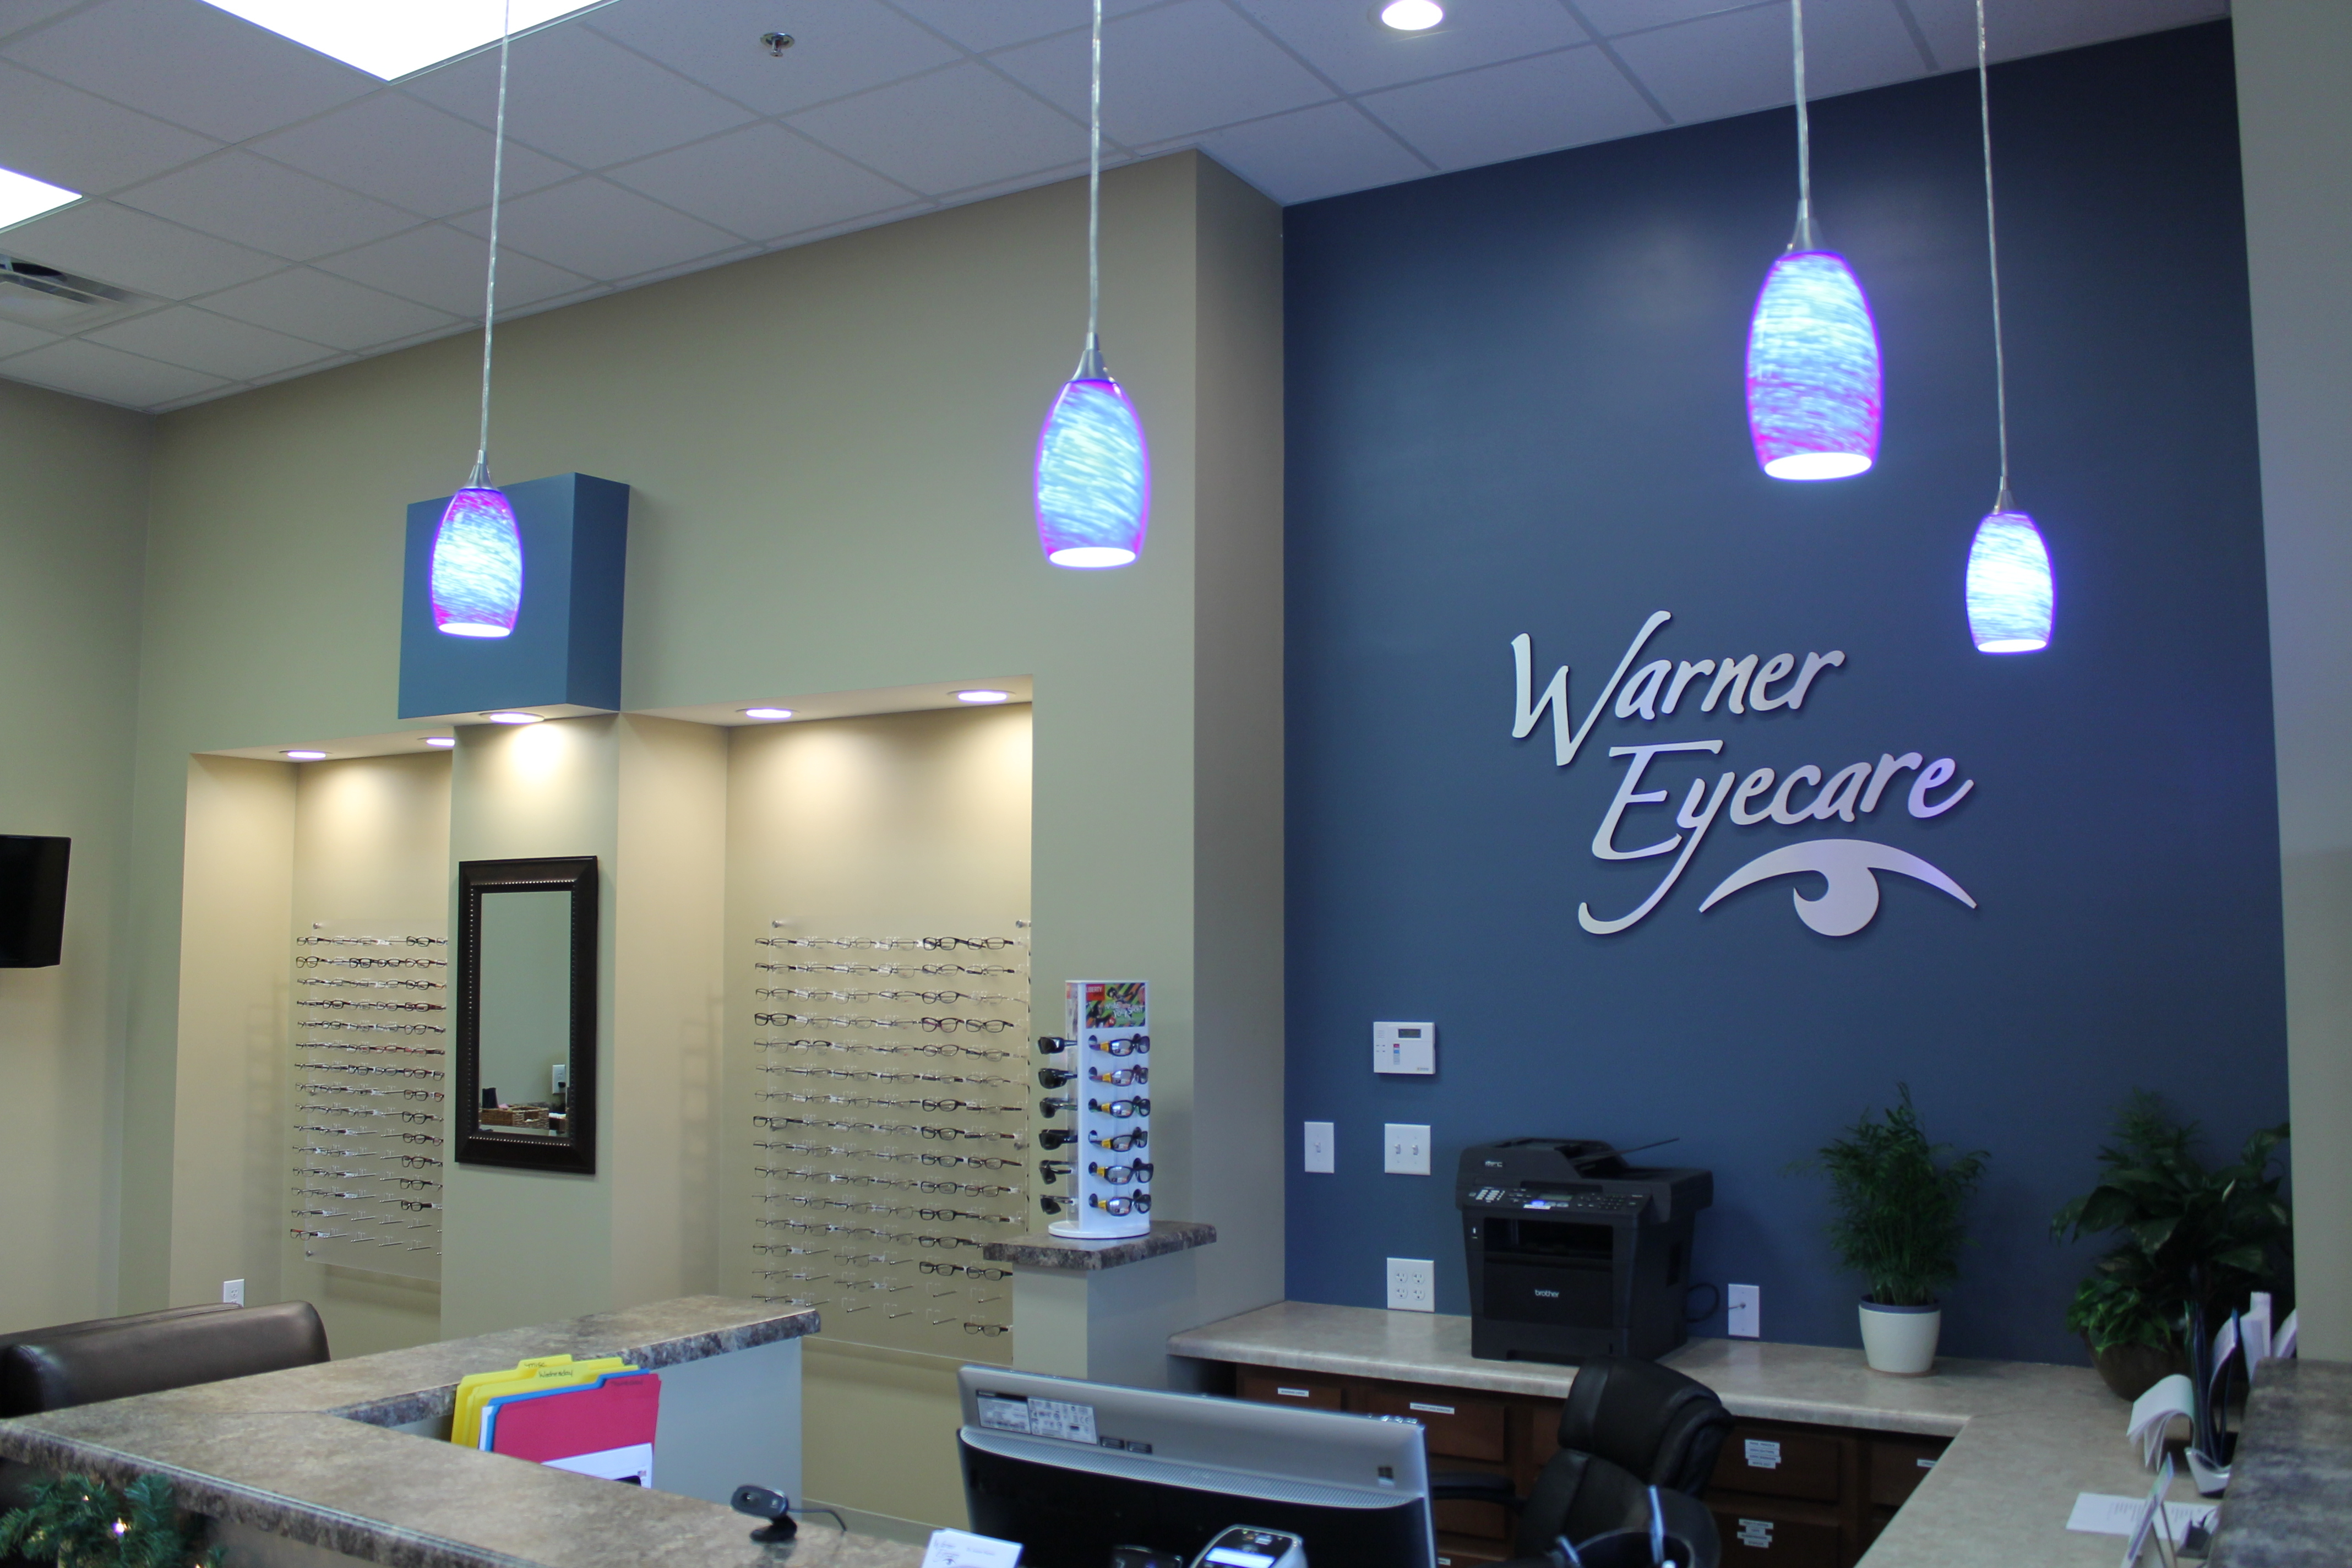 Warner Eyecare image 1